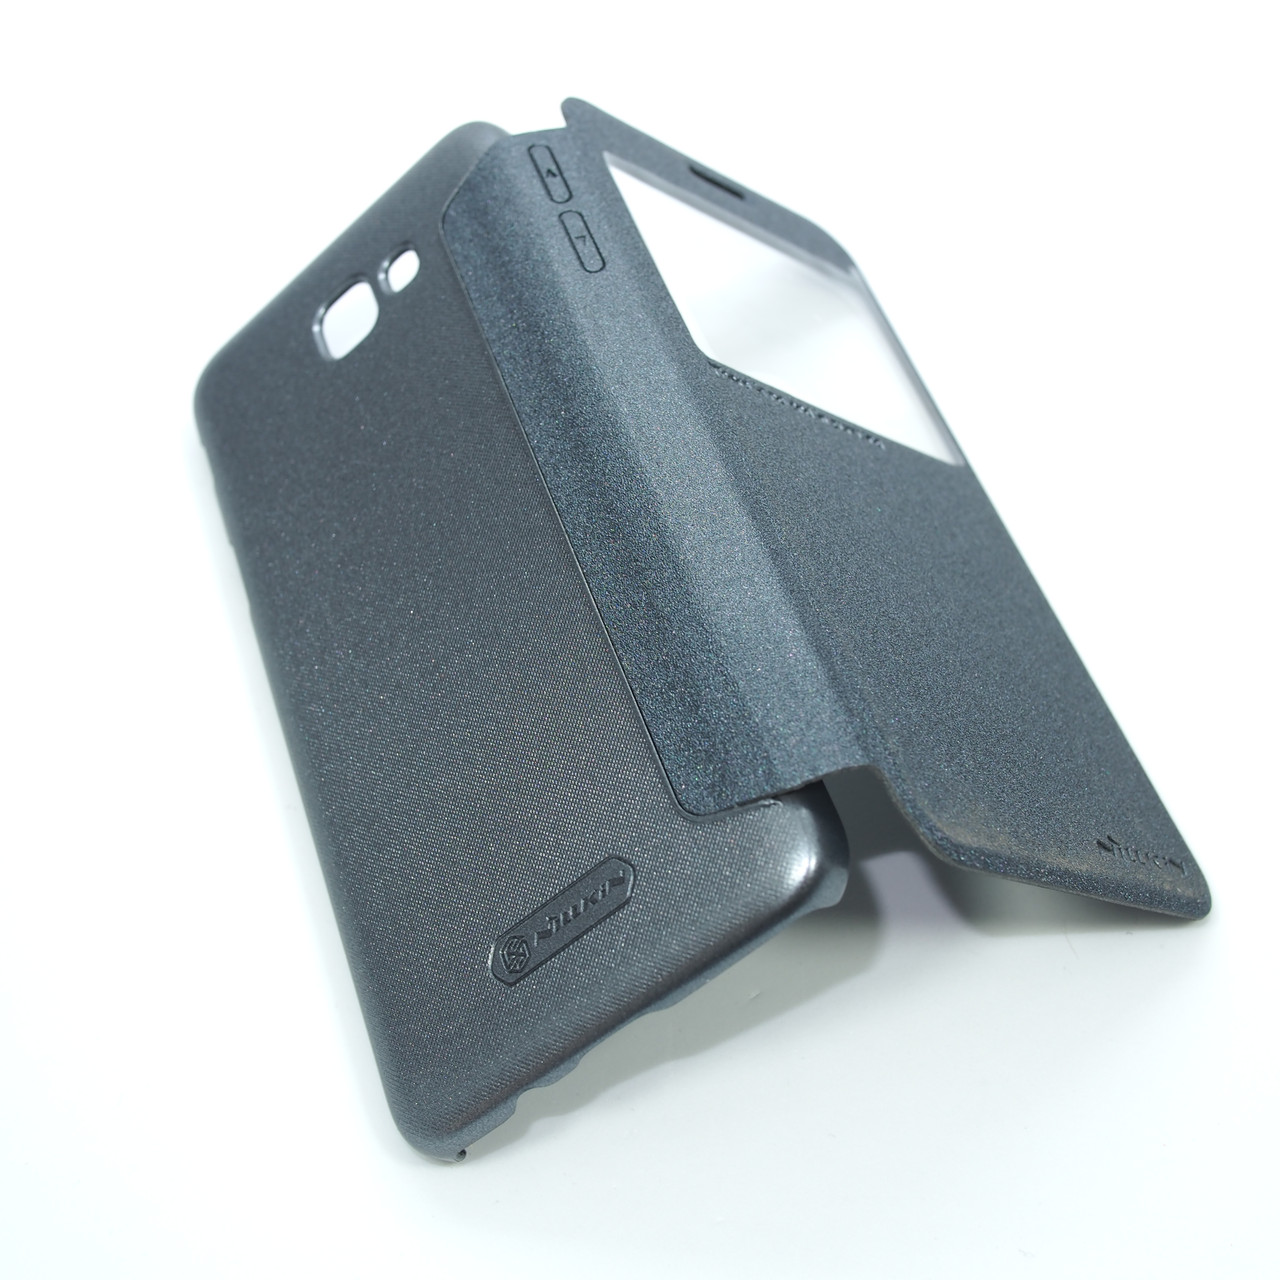 Чехлы для Galaxy J Prime Series Nillkin Sparkle Samsung J5 G570 black (J530) 2017